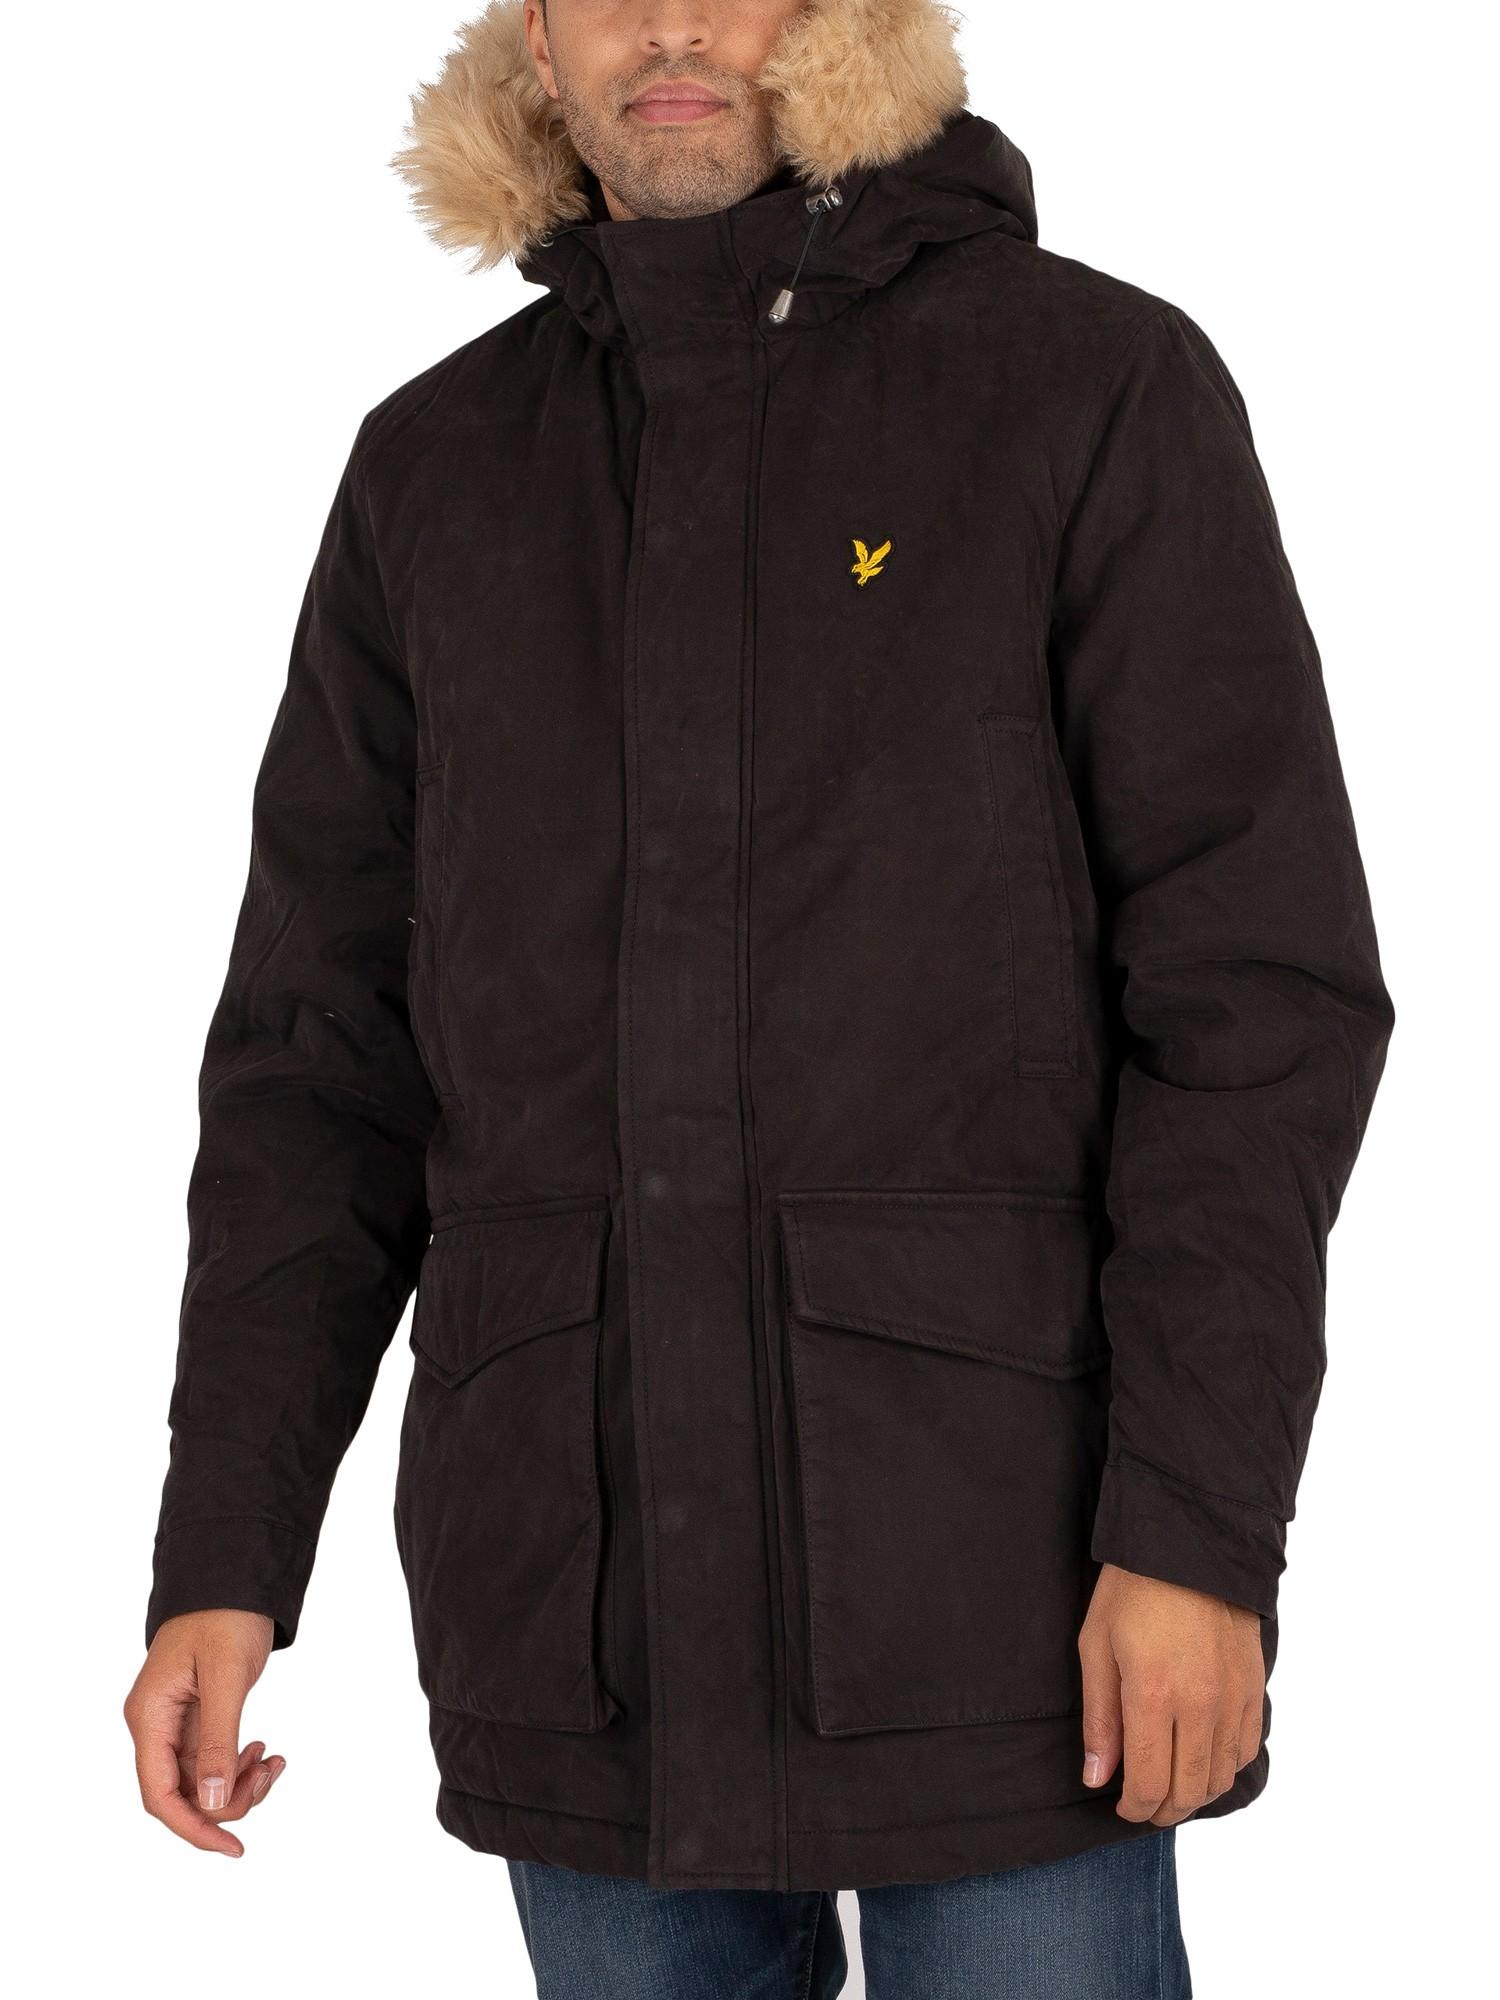 Winter-Weight-Microfleece-Lined-Parka-Jacket